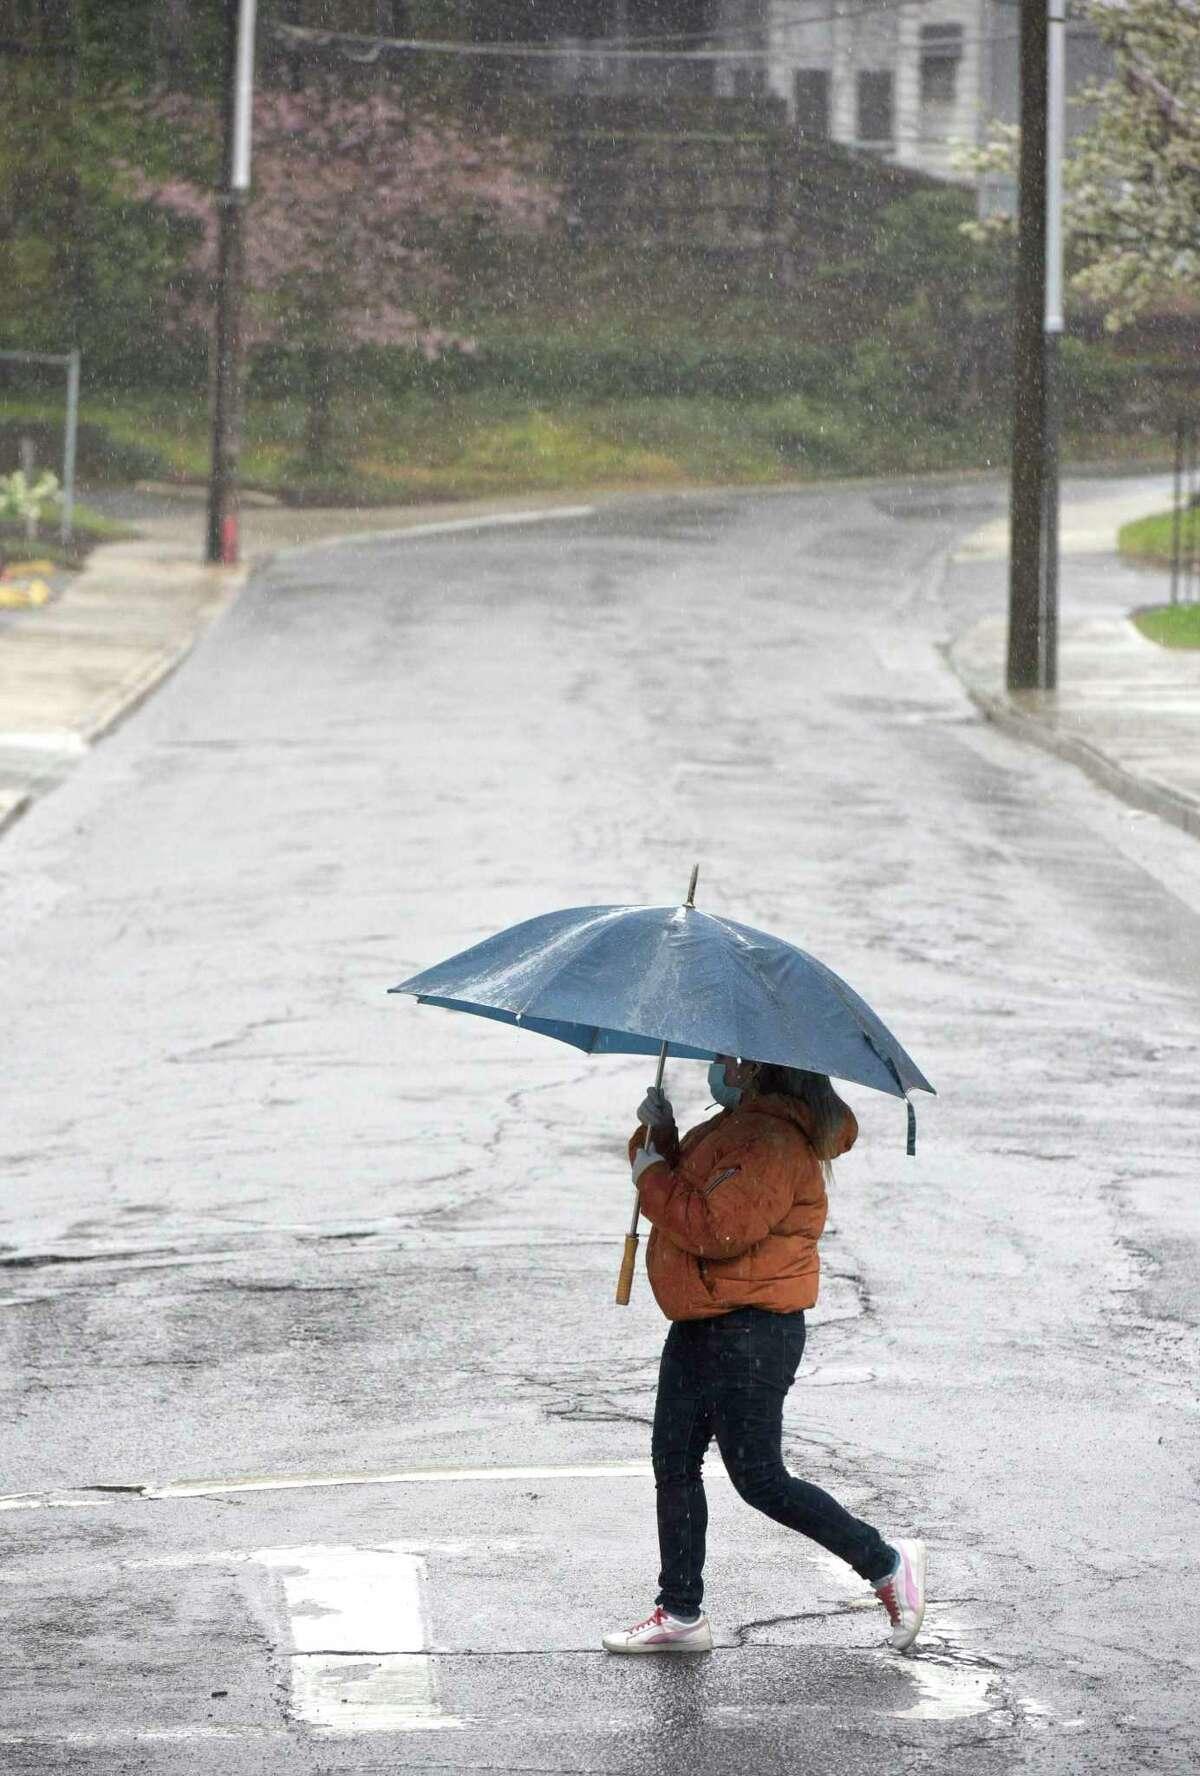 A pedestrian crosses Chapel Place while walking down Main Street during the rain April 13 in Danbury.